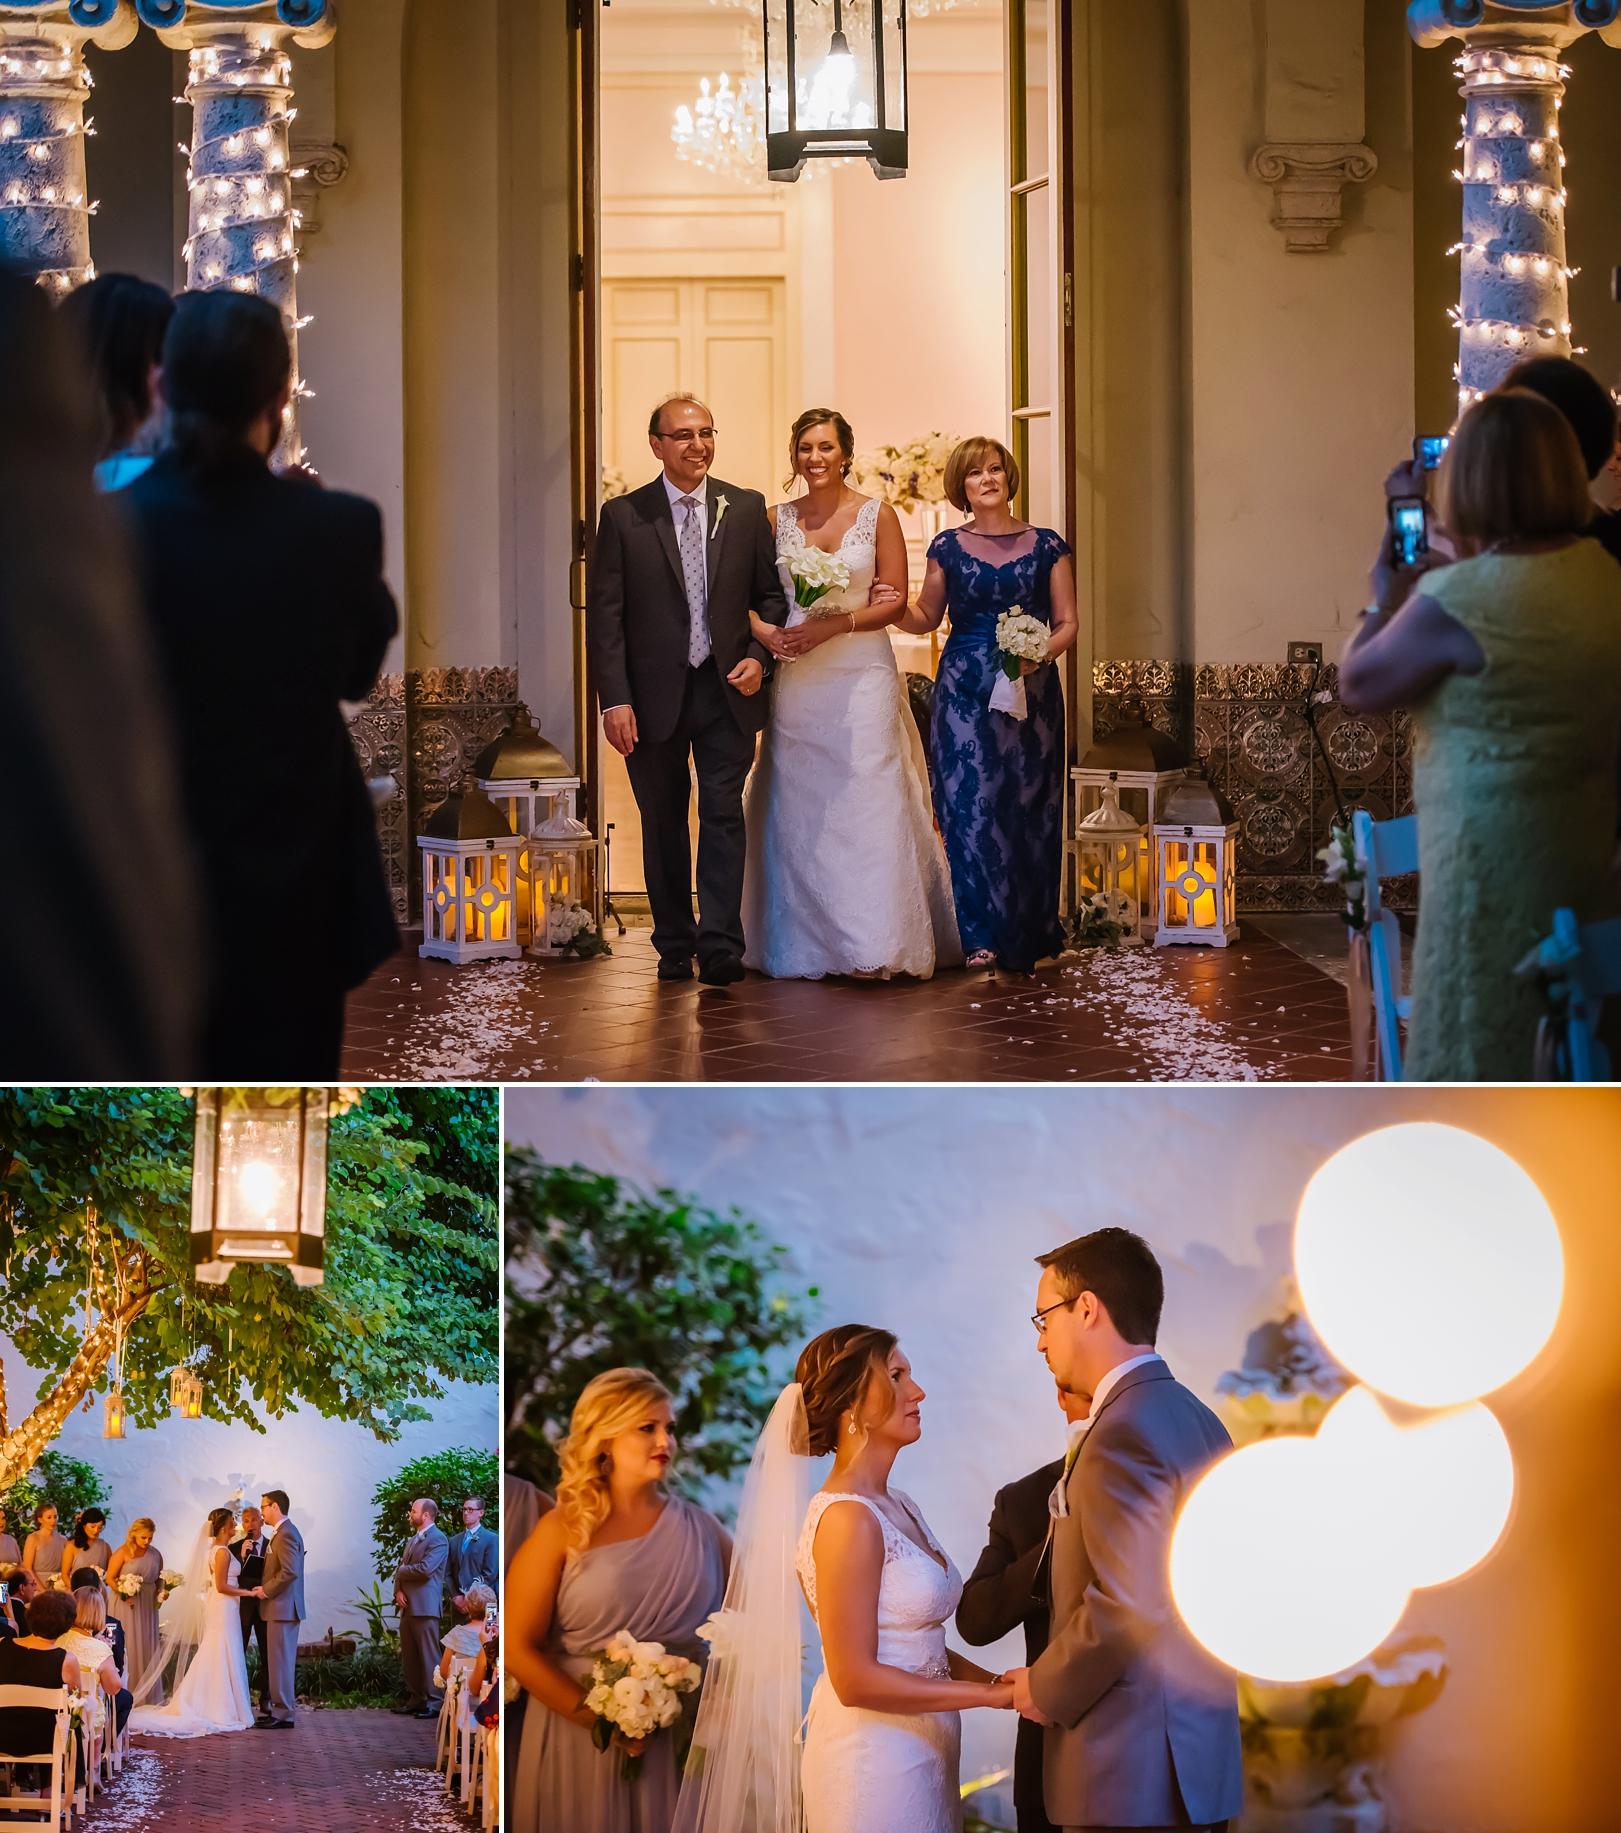 st-pete-art-museum-wedding-vinoy-ashlee-hamon-photography_0014.jpg